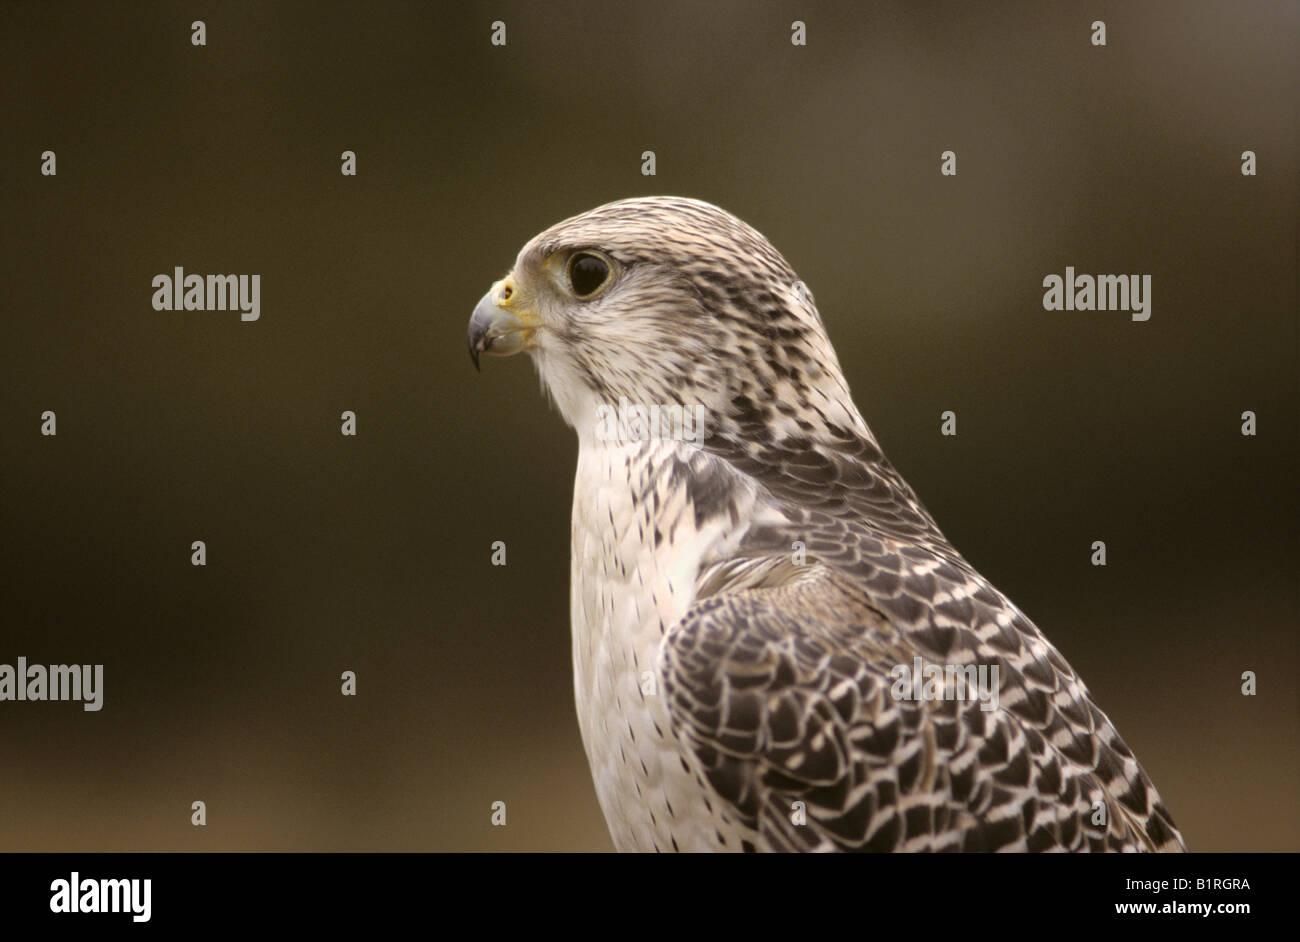 Falcon, Gyrfalcon-Saker Falcon crossbreed (Falco hybrid) - Stock Image